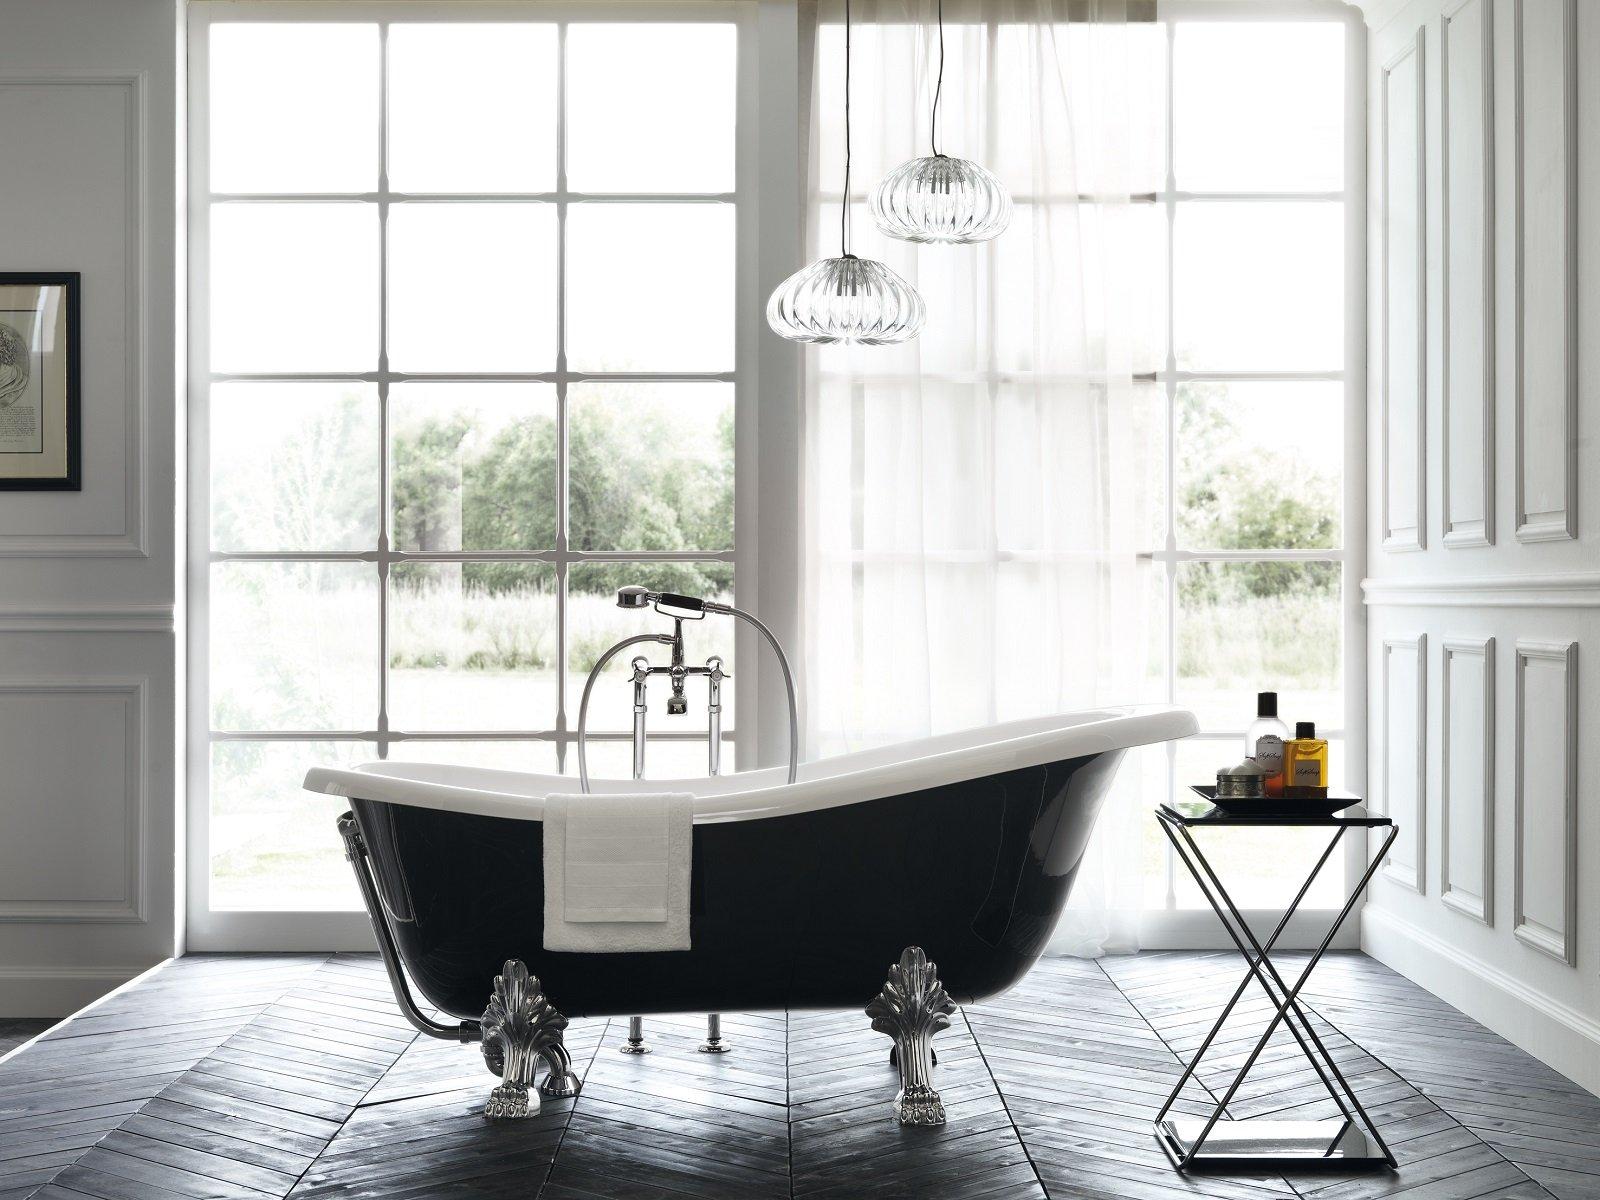 Vasche Da Bagno Stile Inglese : Vasca da bagno on inglese u whosnumbr